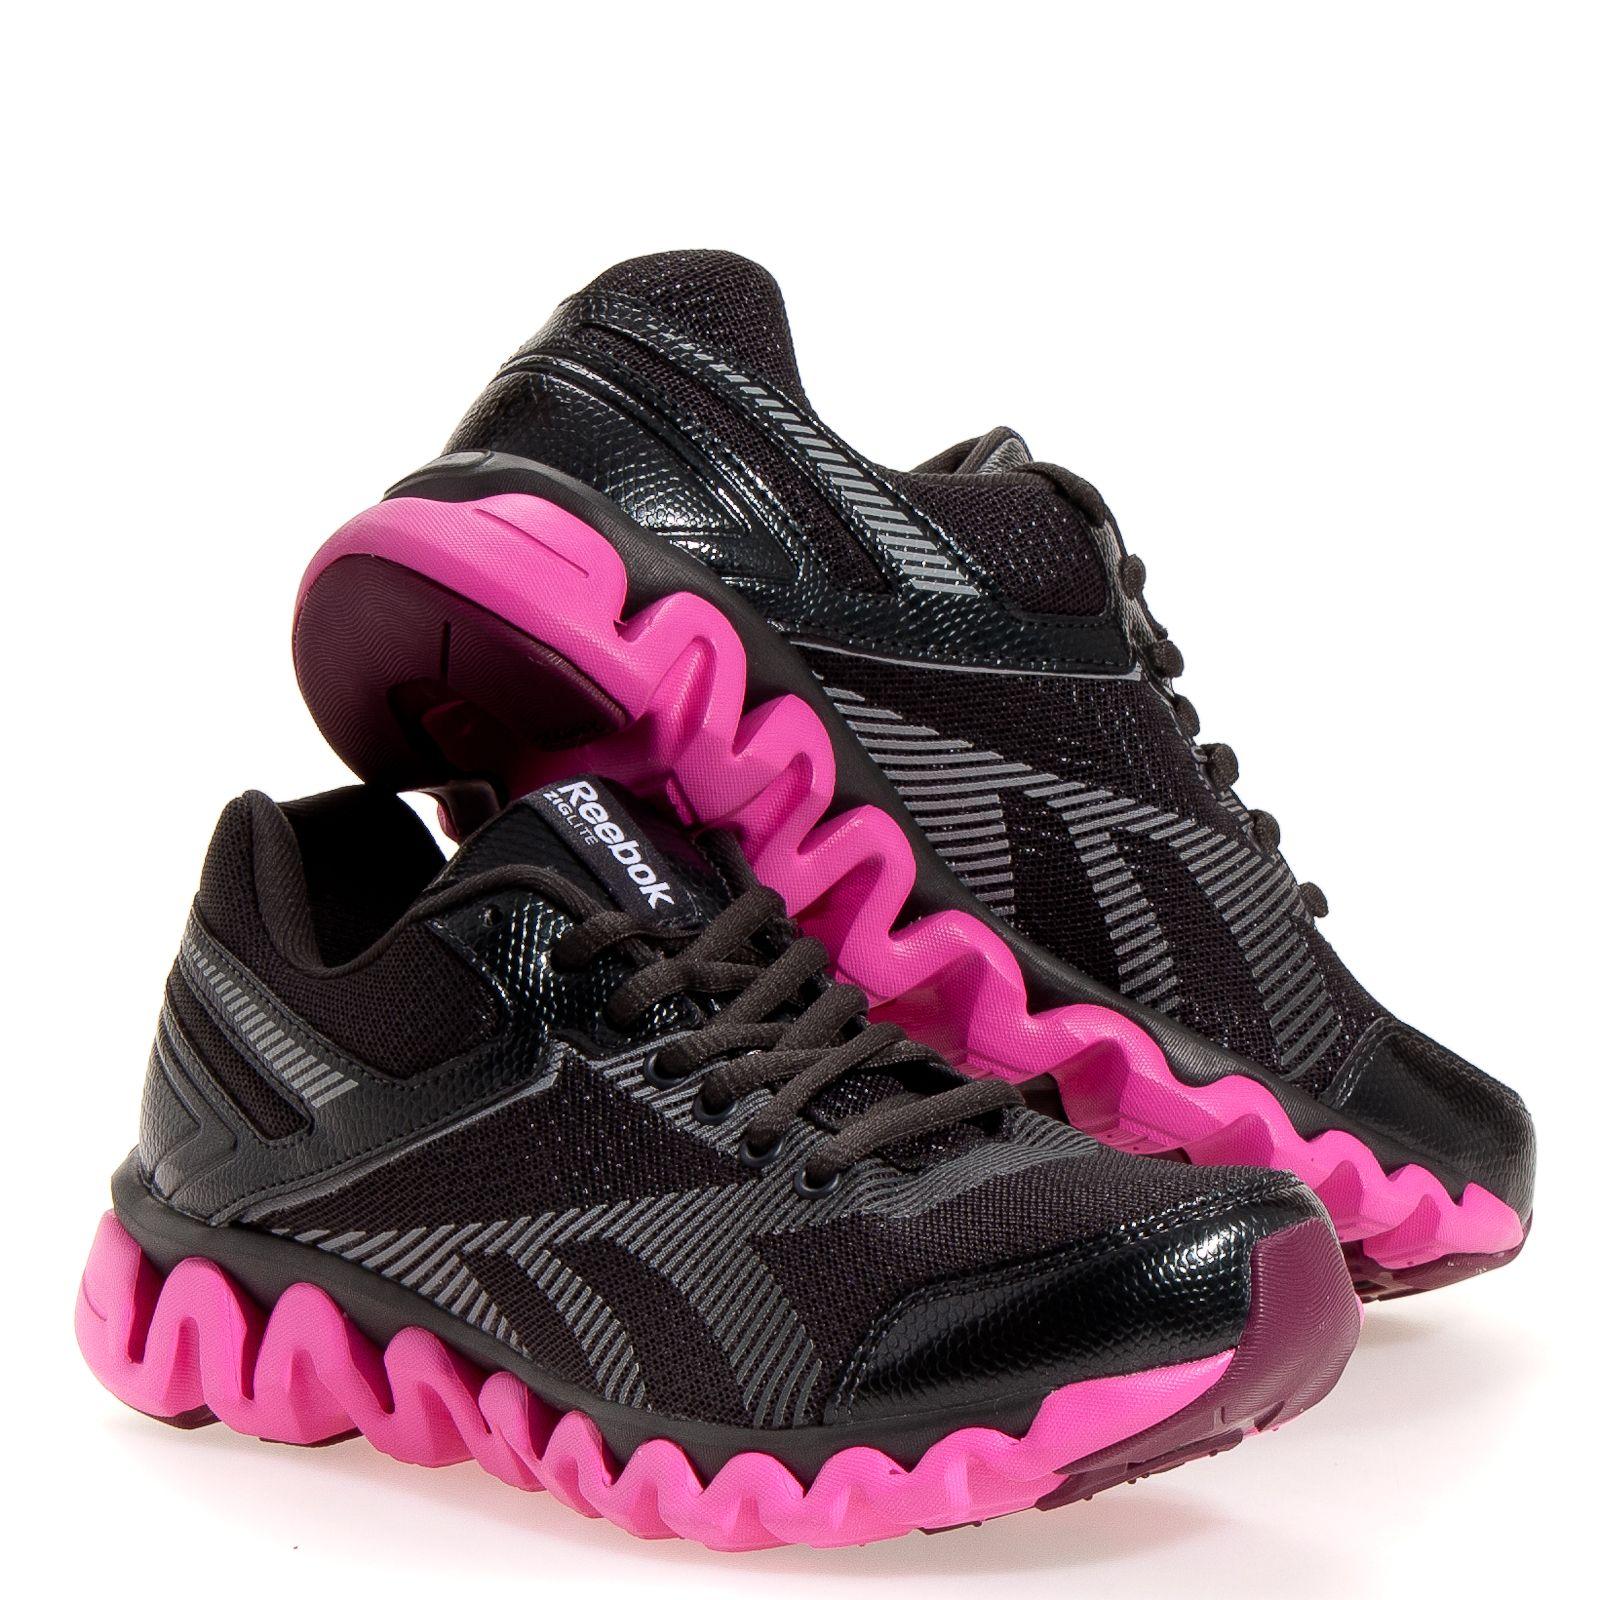 1e2c90c3a78f Reebok Ziglite Electrify Women s Running Shoes  Black 7